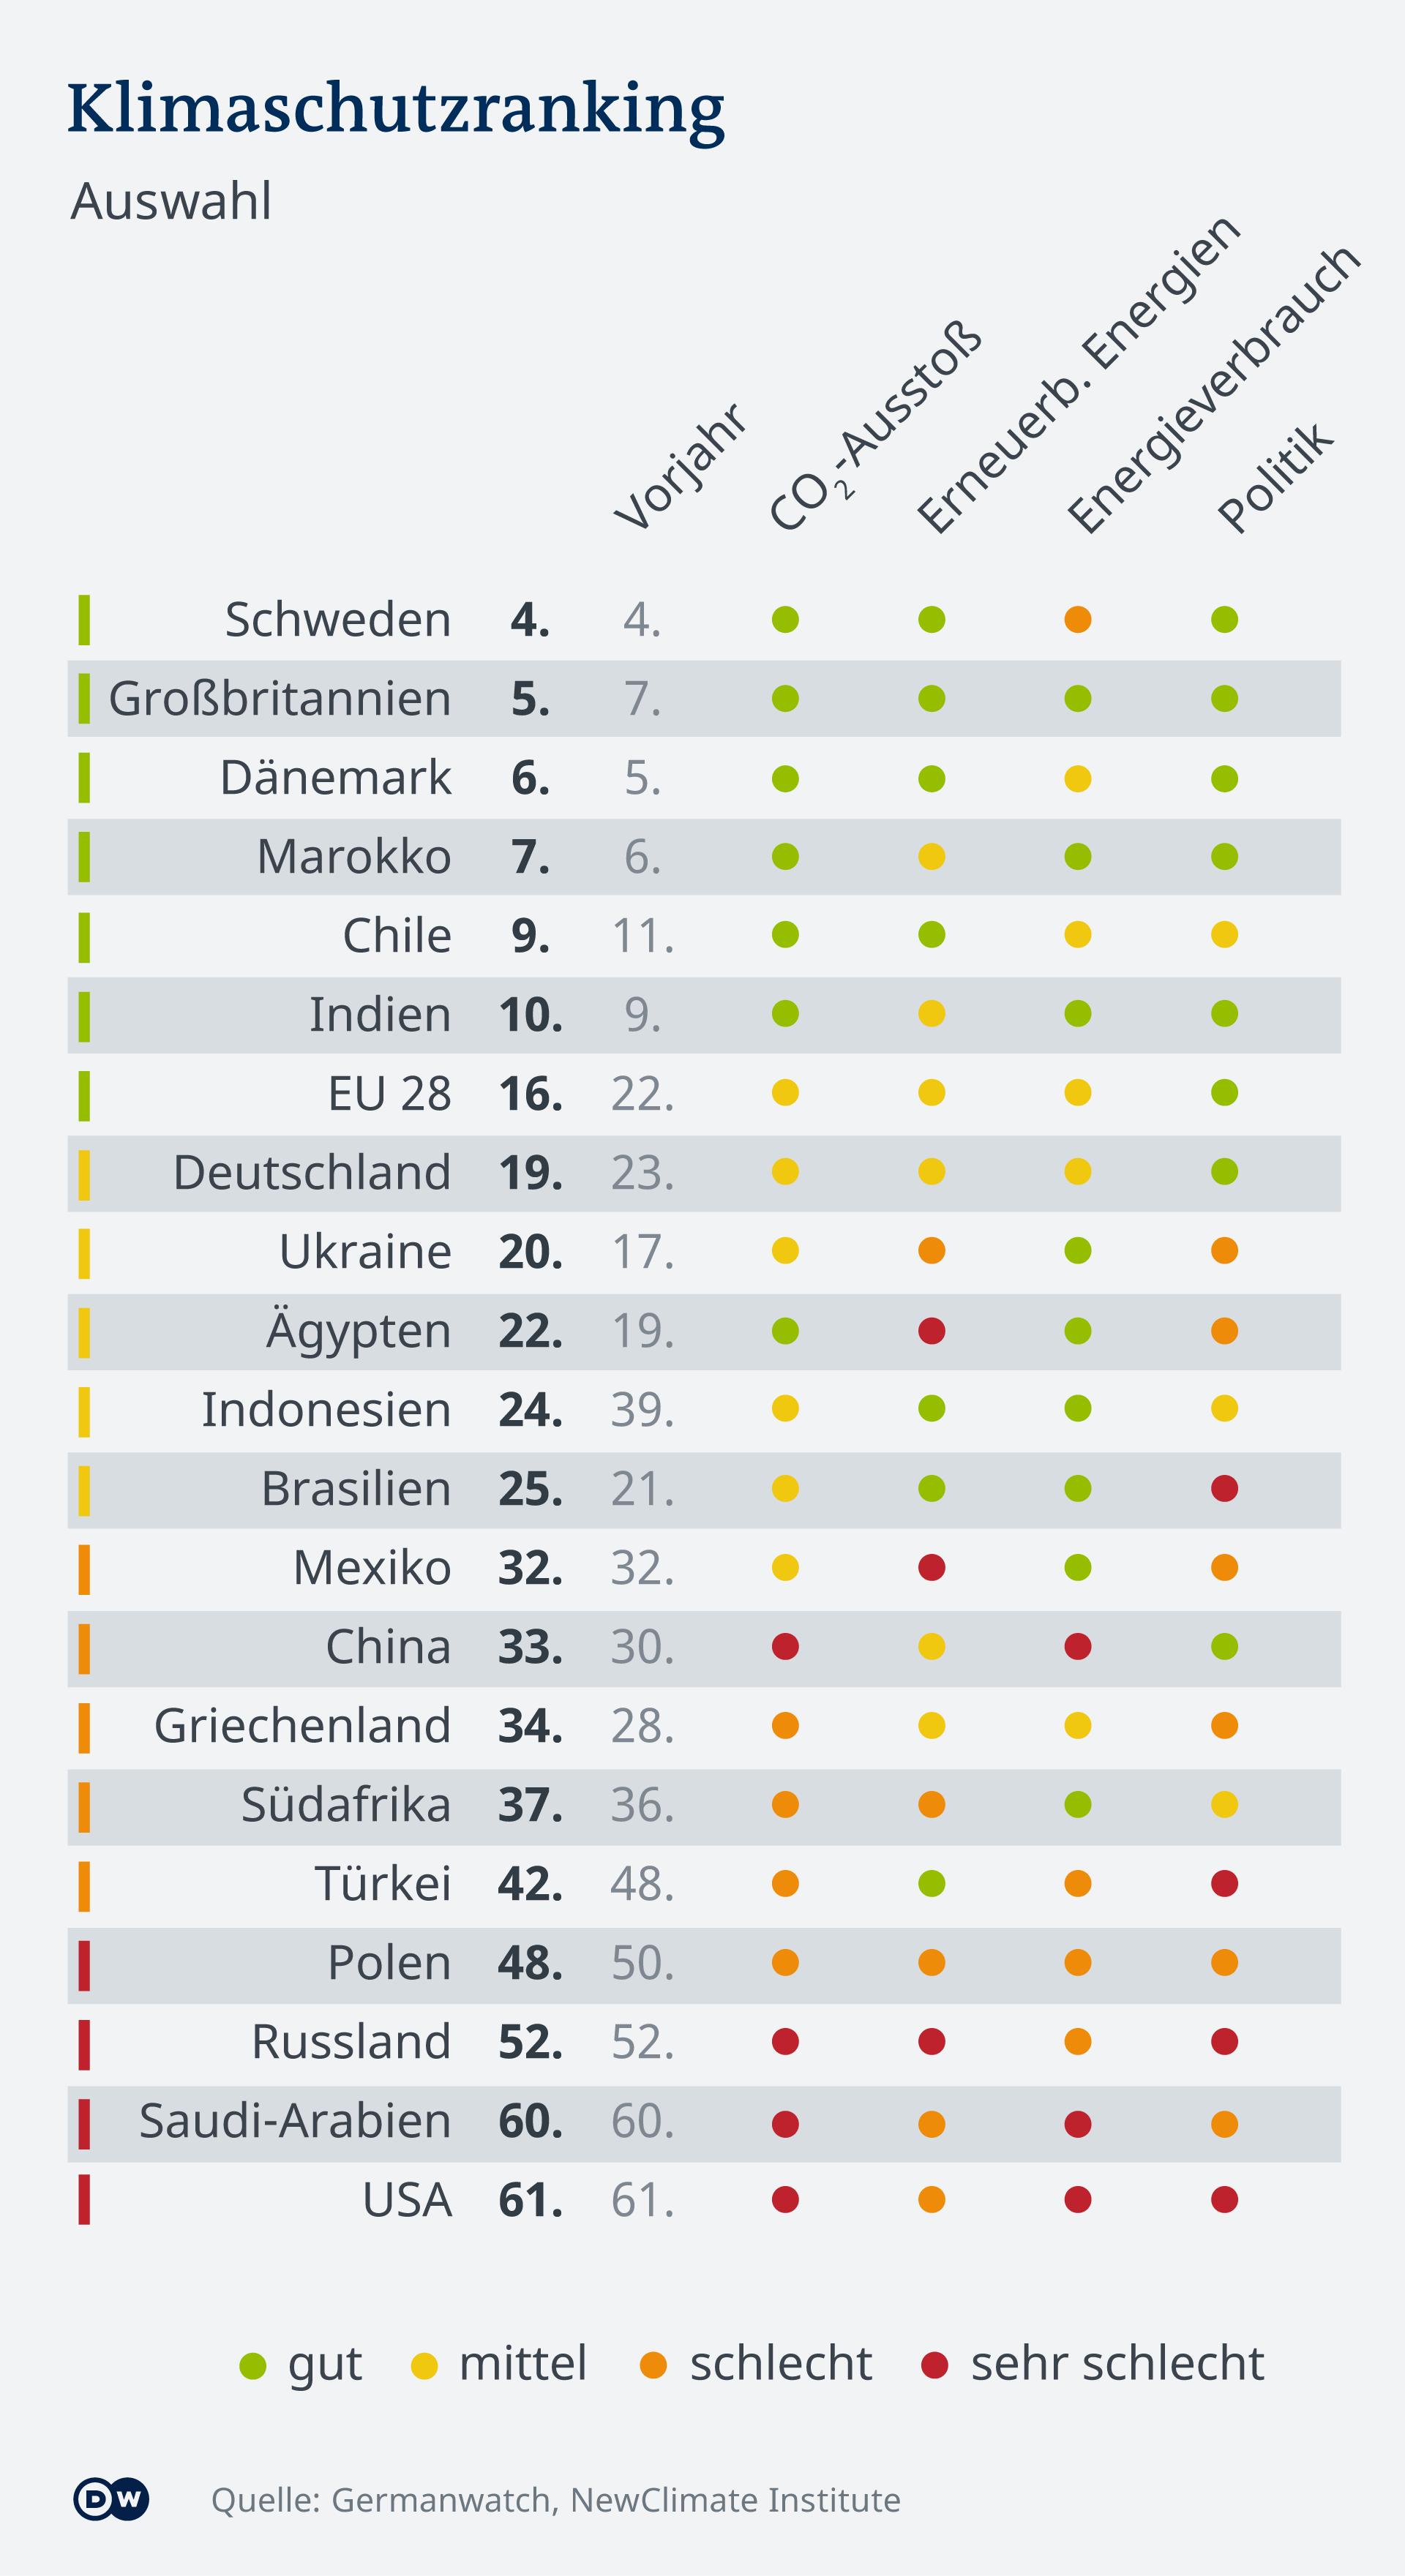 Infografik - Klimaschutz Ranking weltweit Auswahl 2021 - DE